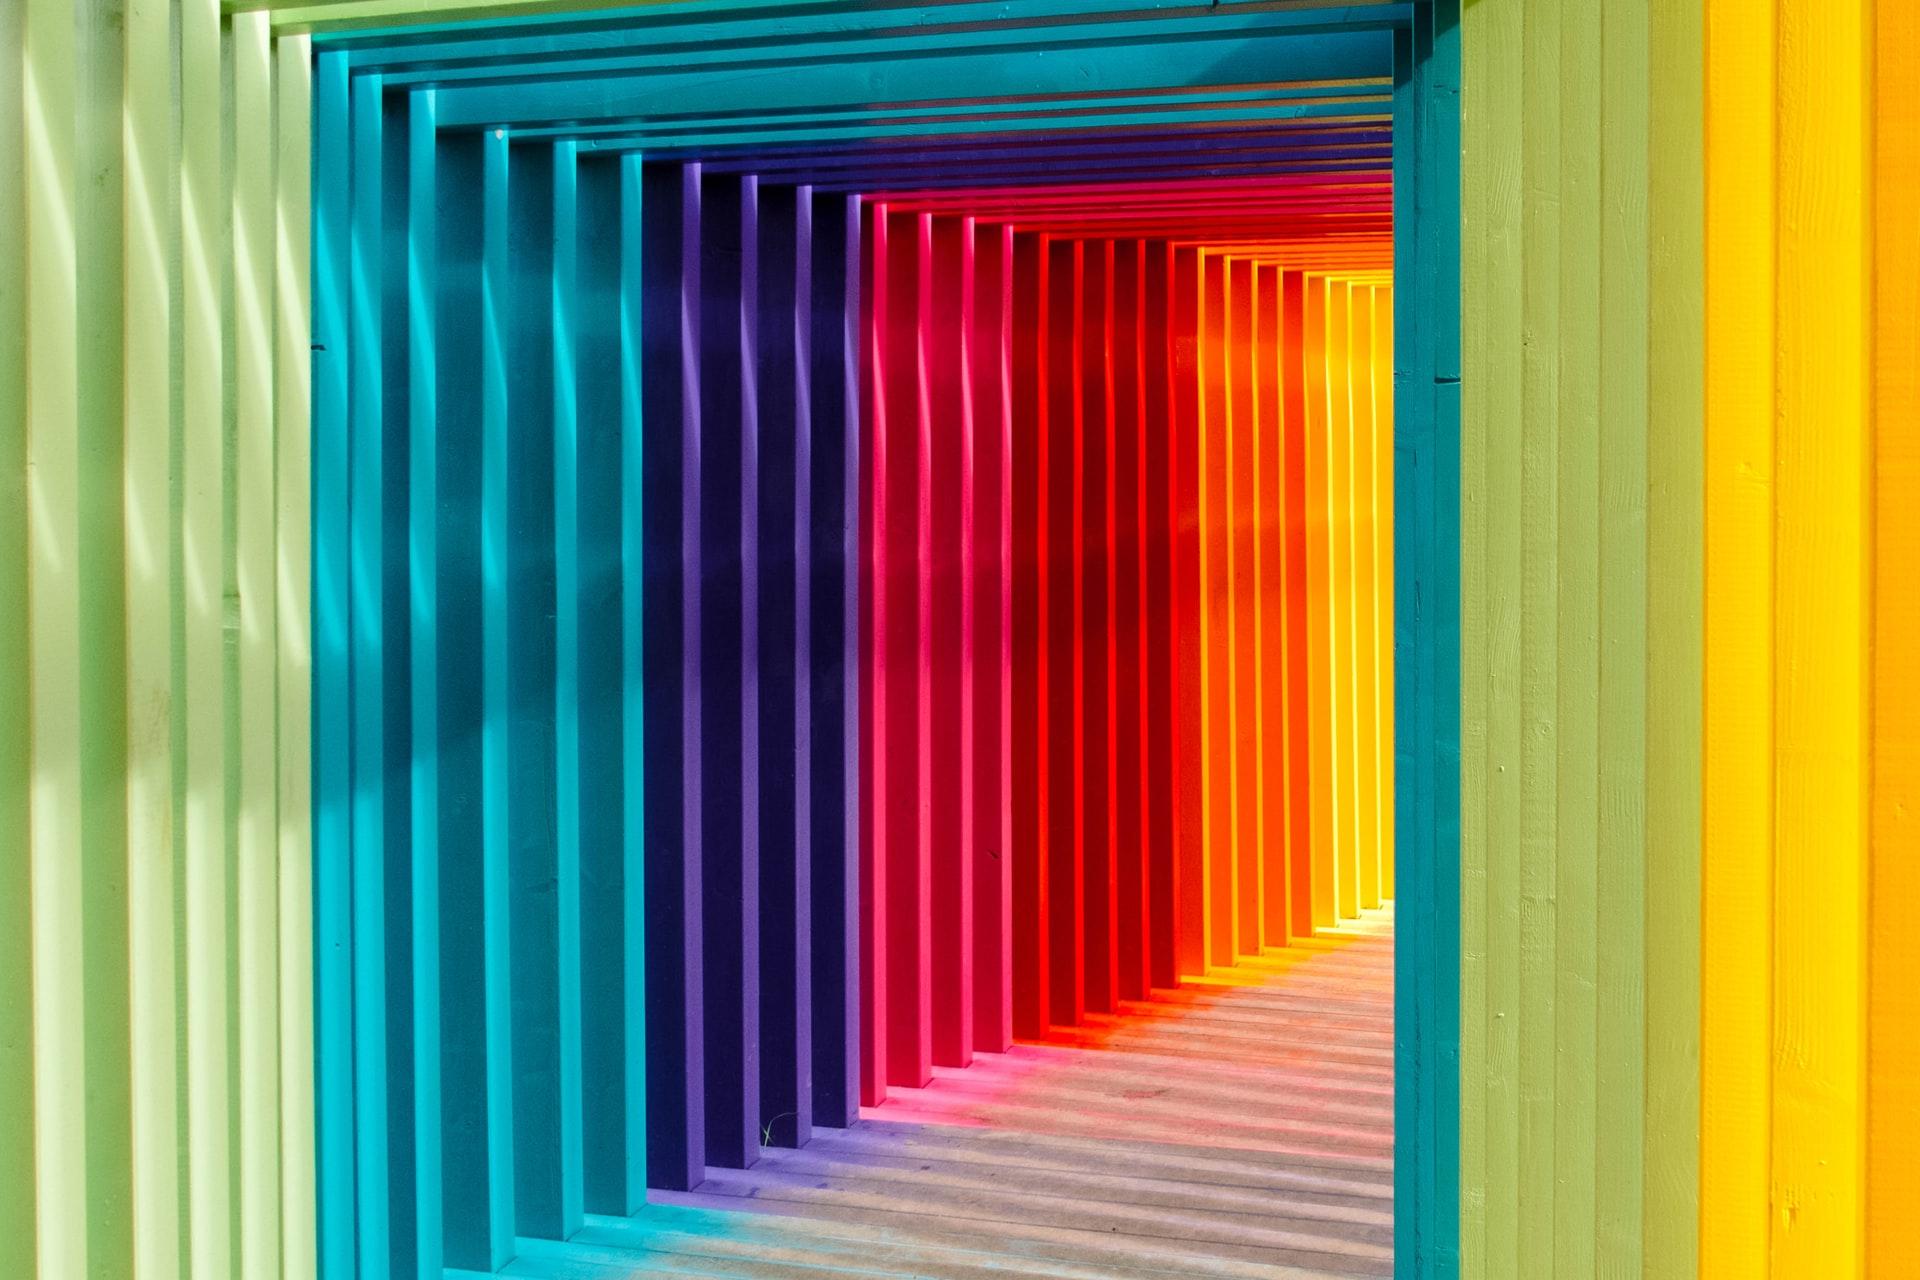 5 Ways Color Impacts Your Website